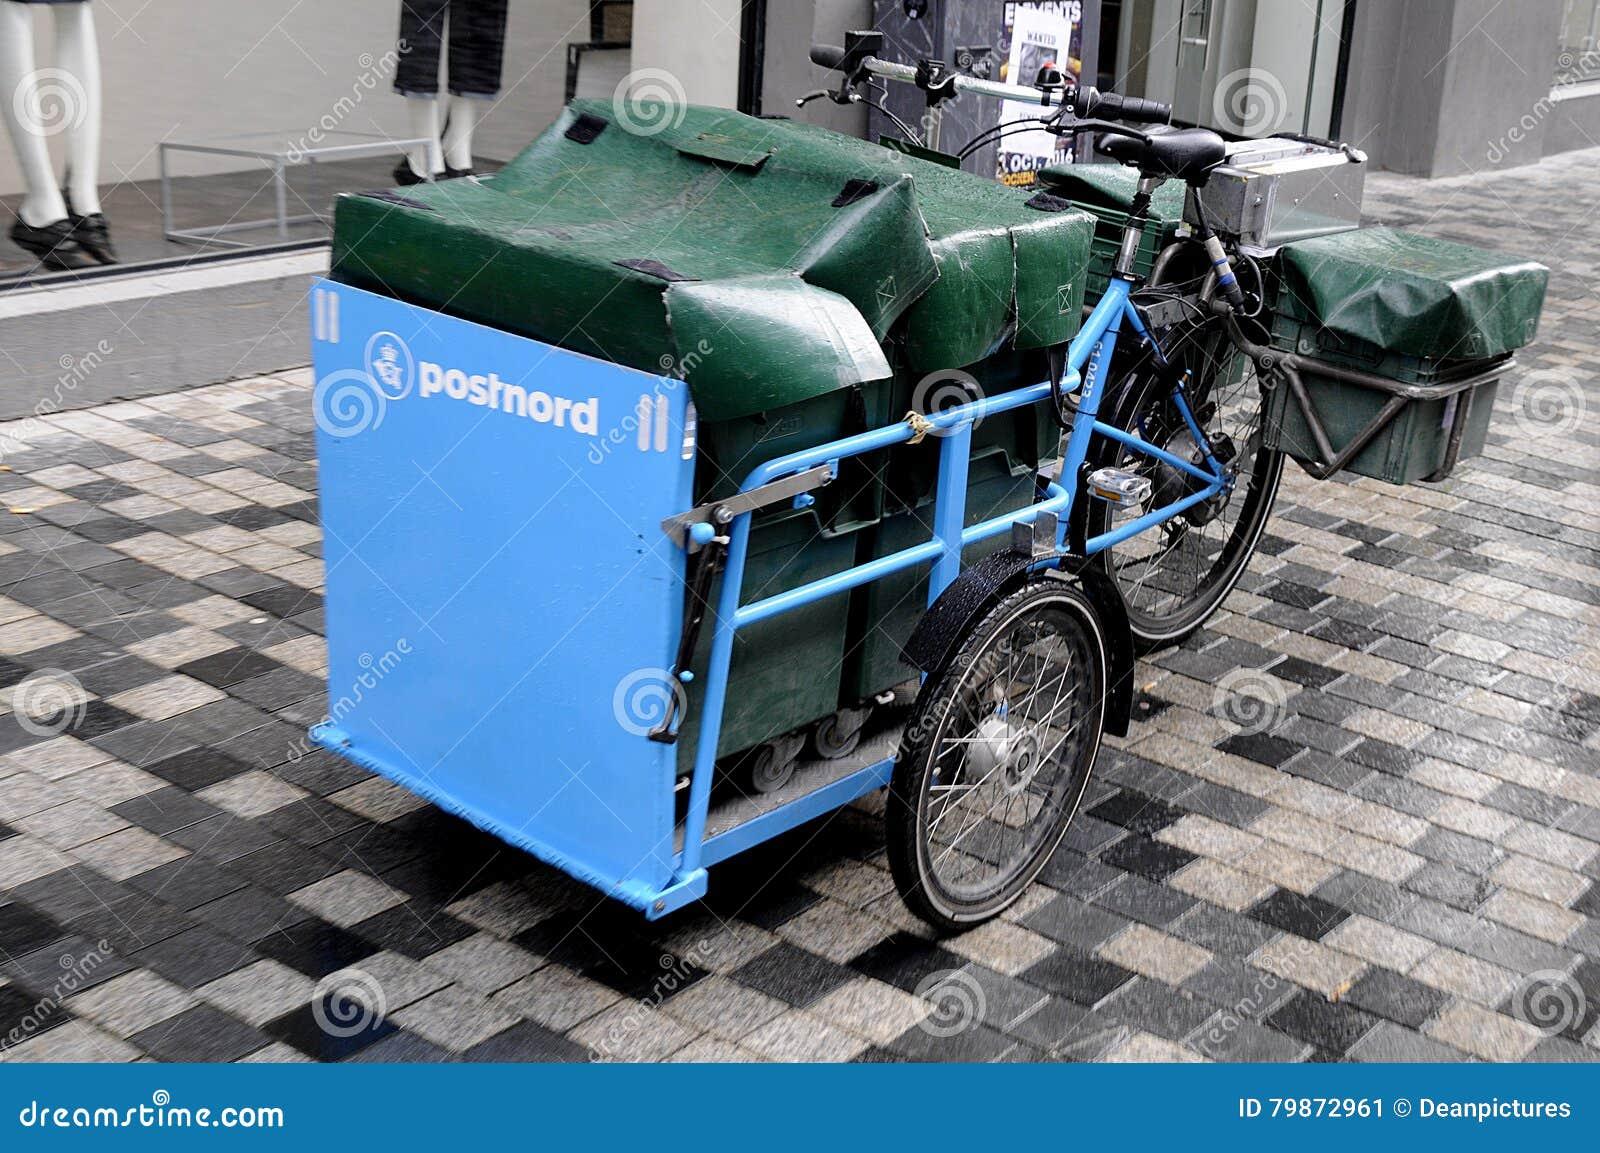 dcaf42f7 Copenhagen / Denmark_ 02nd.. November 2016 _ Mail man delivery bike from  postnord Photo. Francis Joseph Dean/Deanpictures.